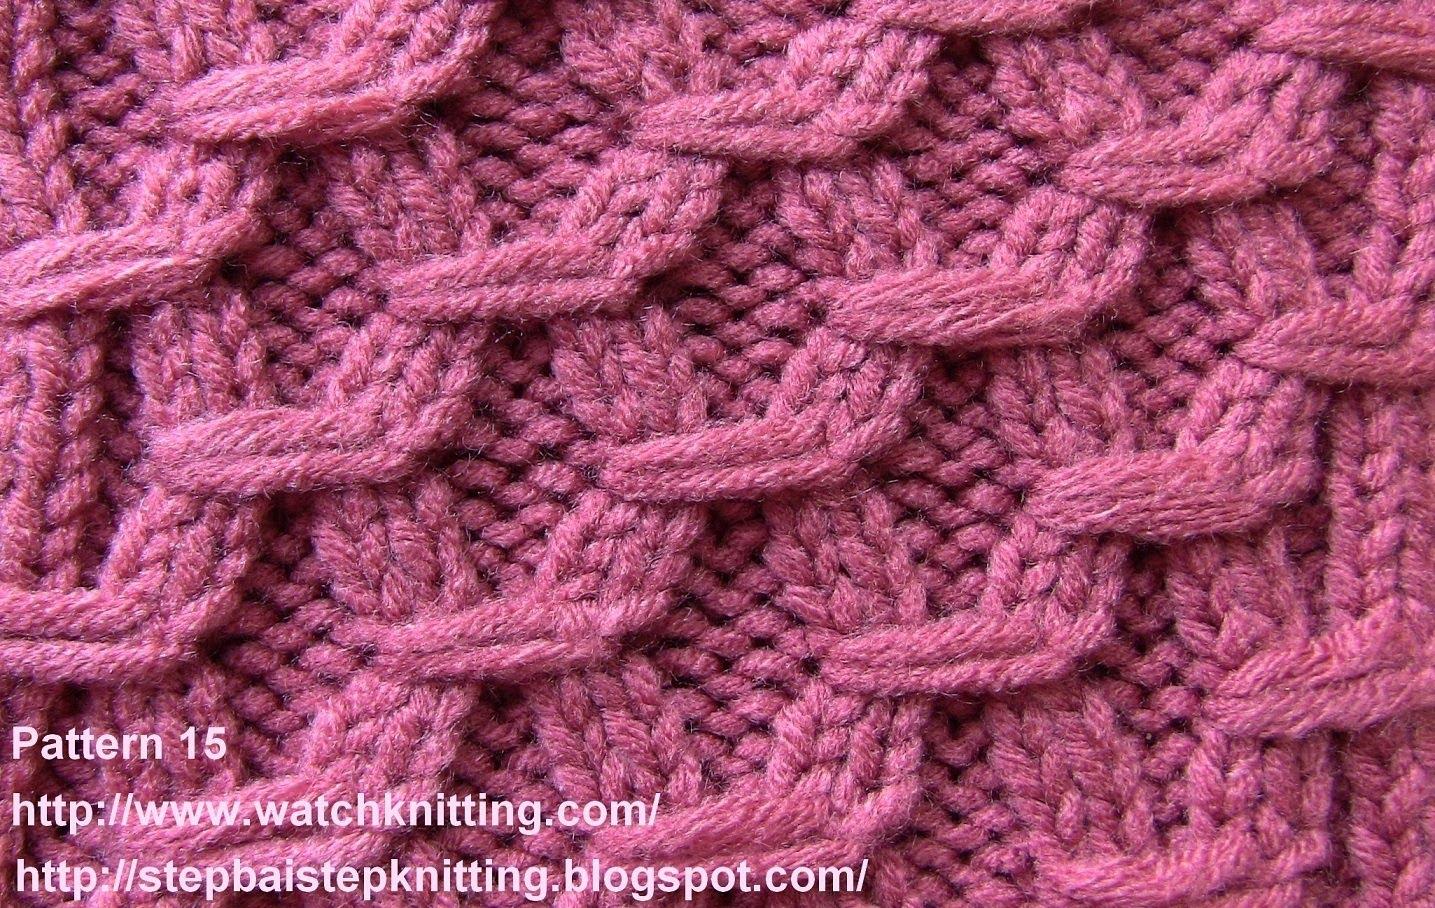 Knitting Designs (hexagonal ) - embossed stitches - free knitting tutorial - watch knitting zkwnibb